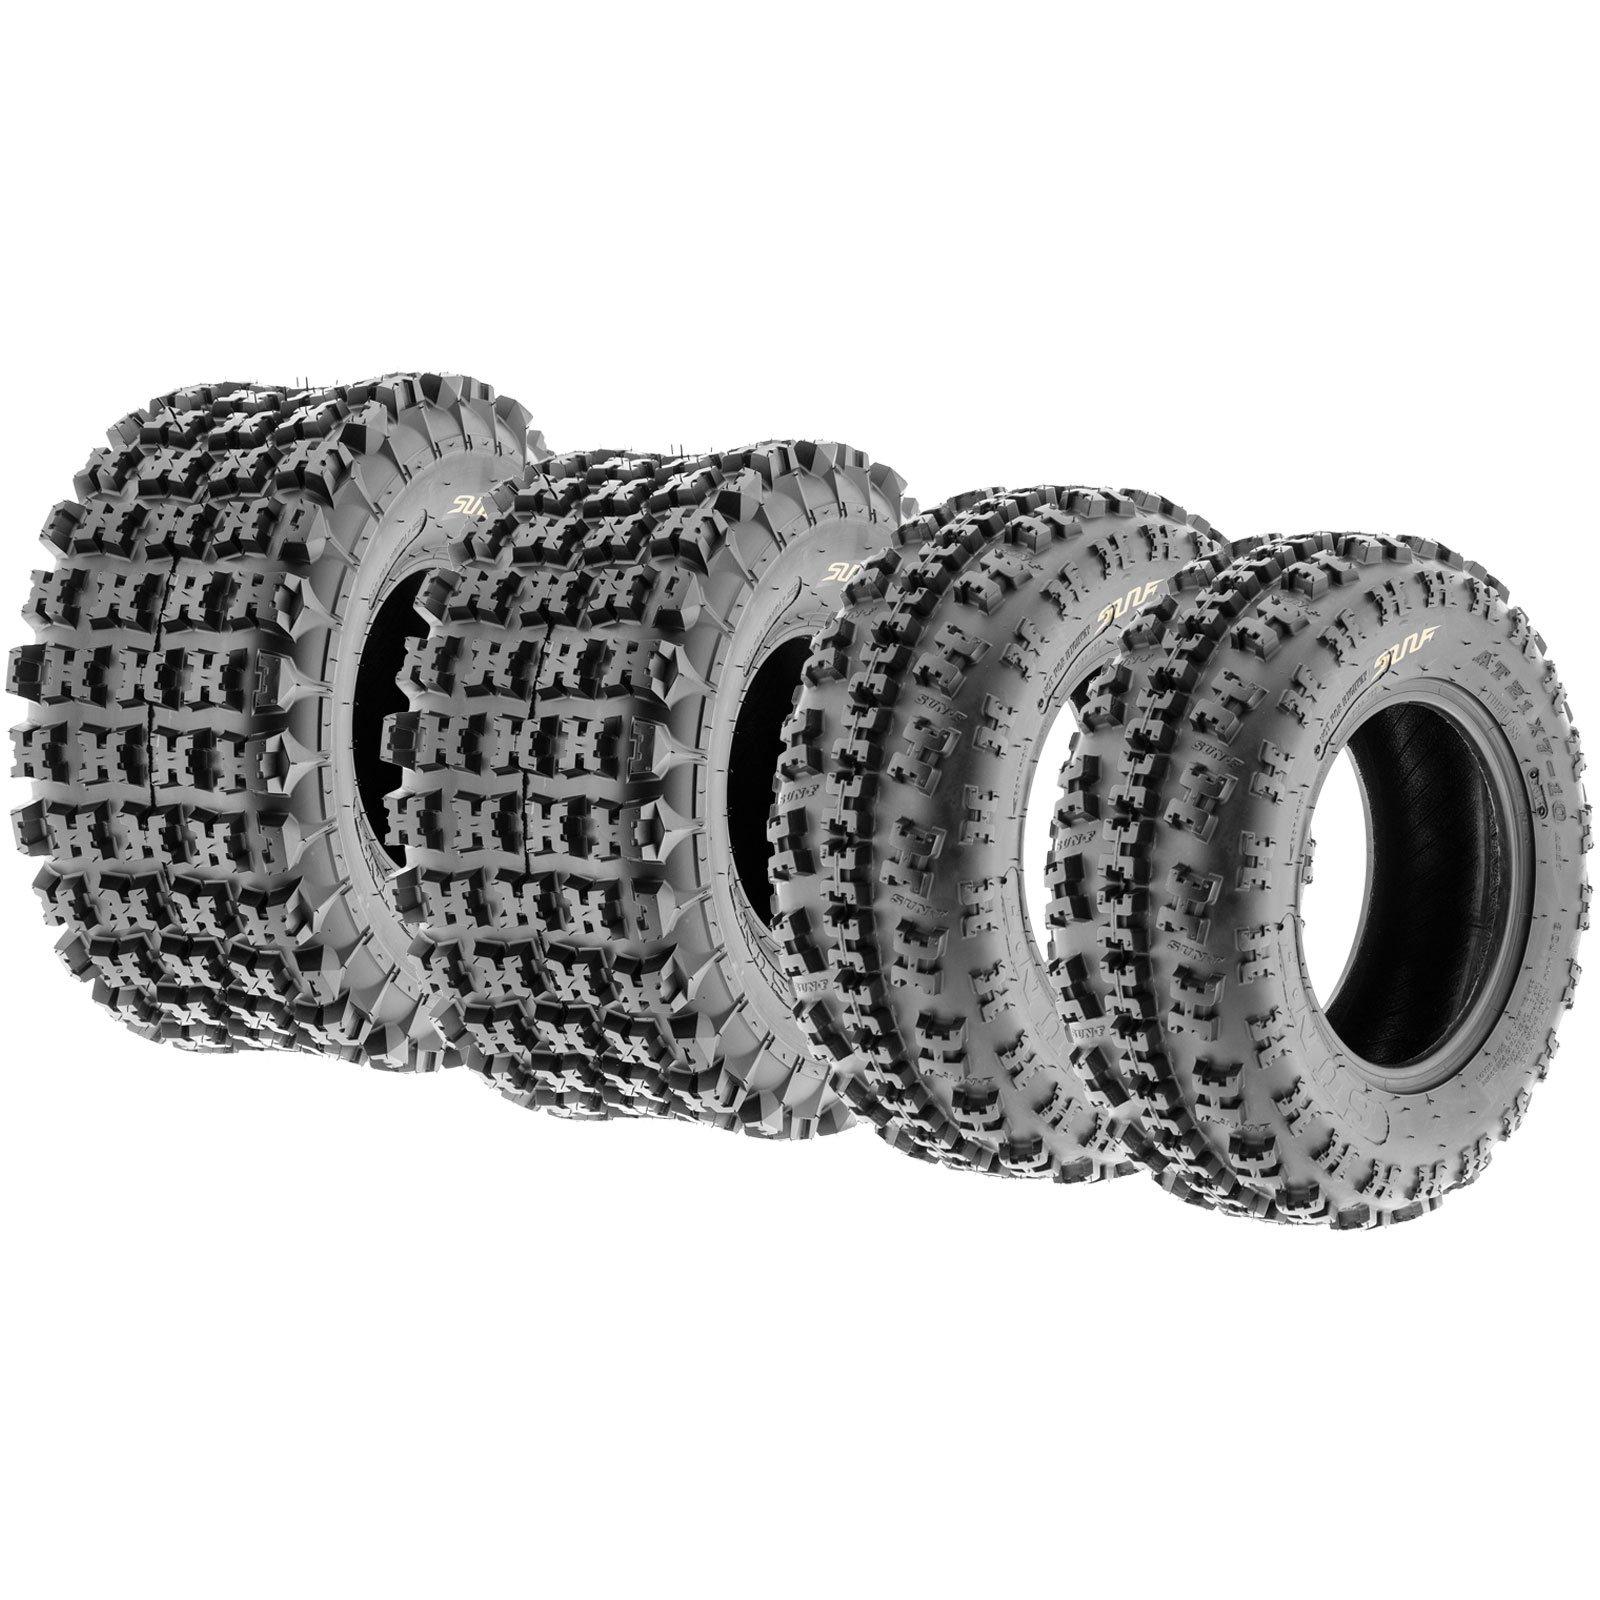 Set of 4 SunF A027 ATV Tire 22x7-10 Front & 22x10-9 Rear